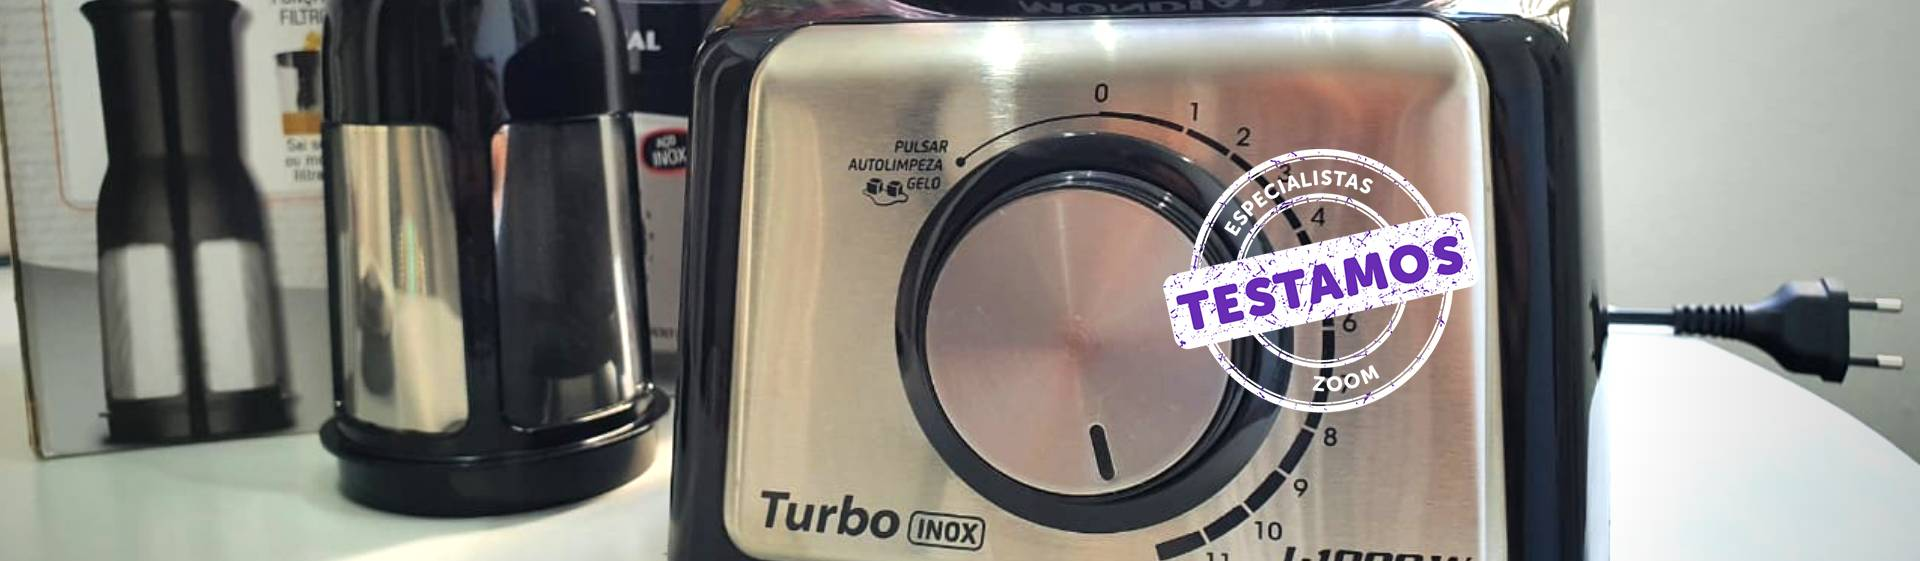 Liquidificador Mondial Turbo Inox L-1000: alta potência e bom custo-benefício